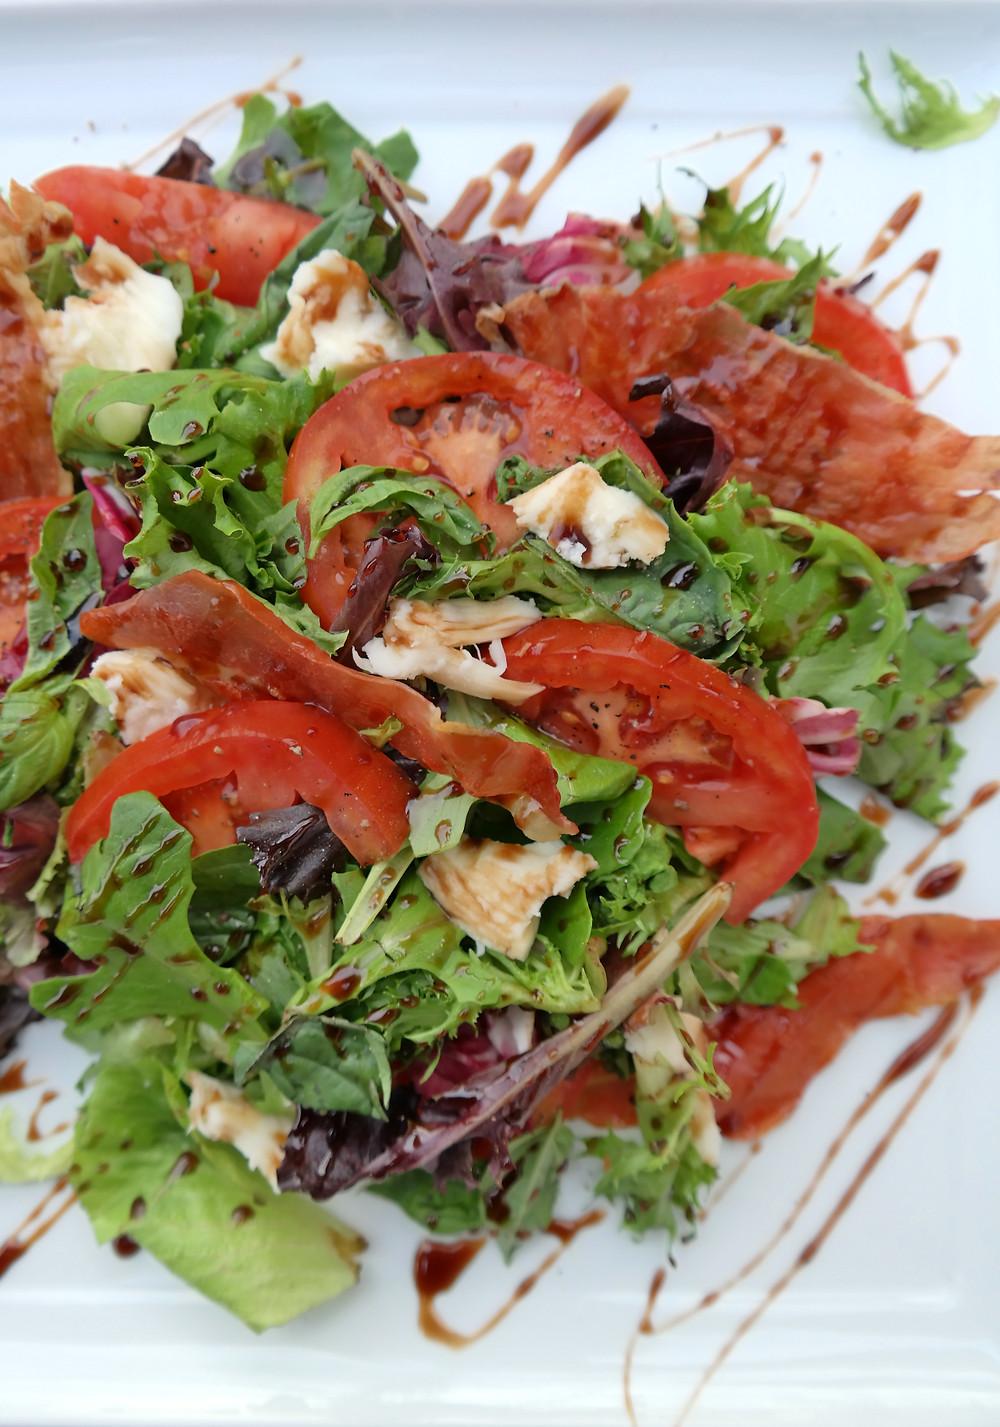 Tomato & Basil Salad with Crispy Prosciutto | eatlovegarlic.com @eatlovegarlic